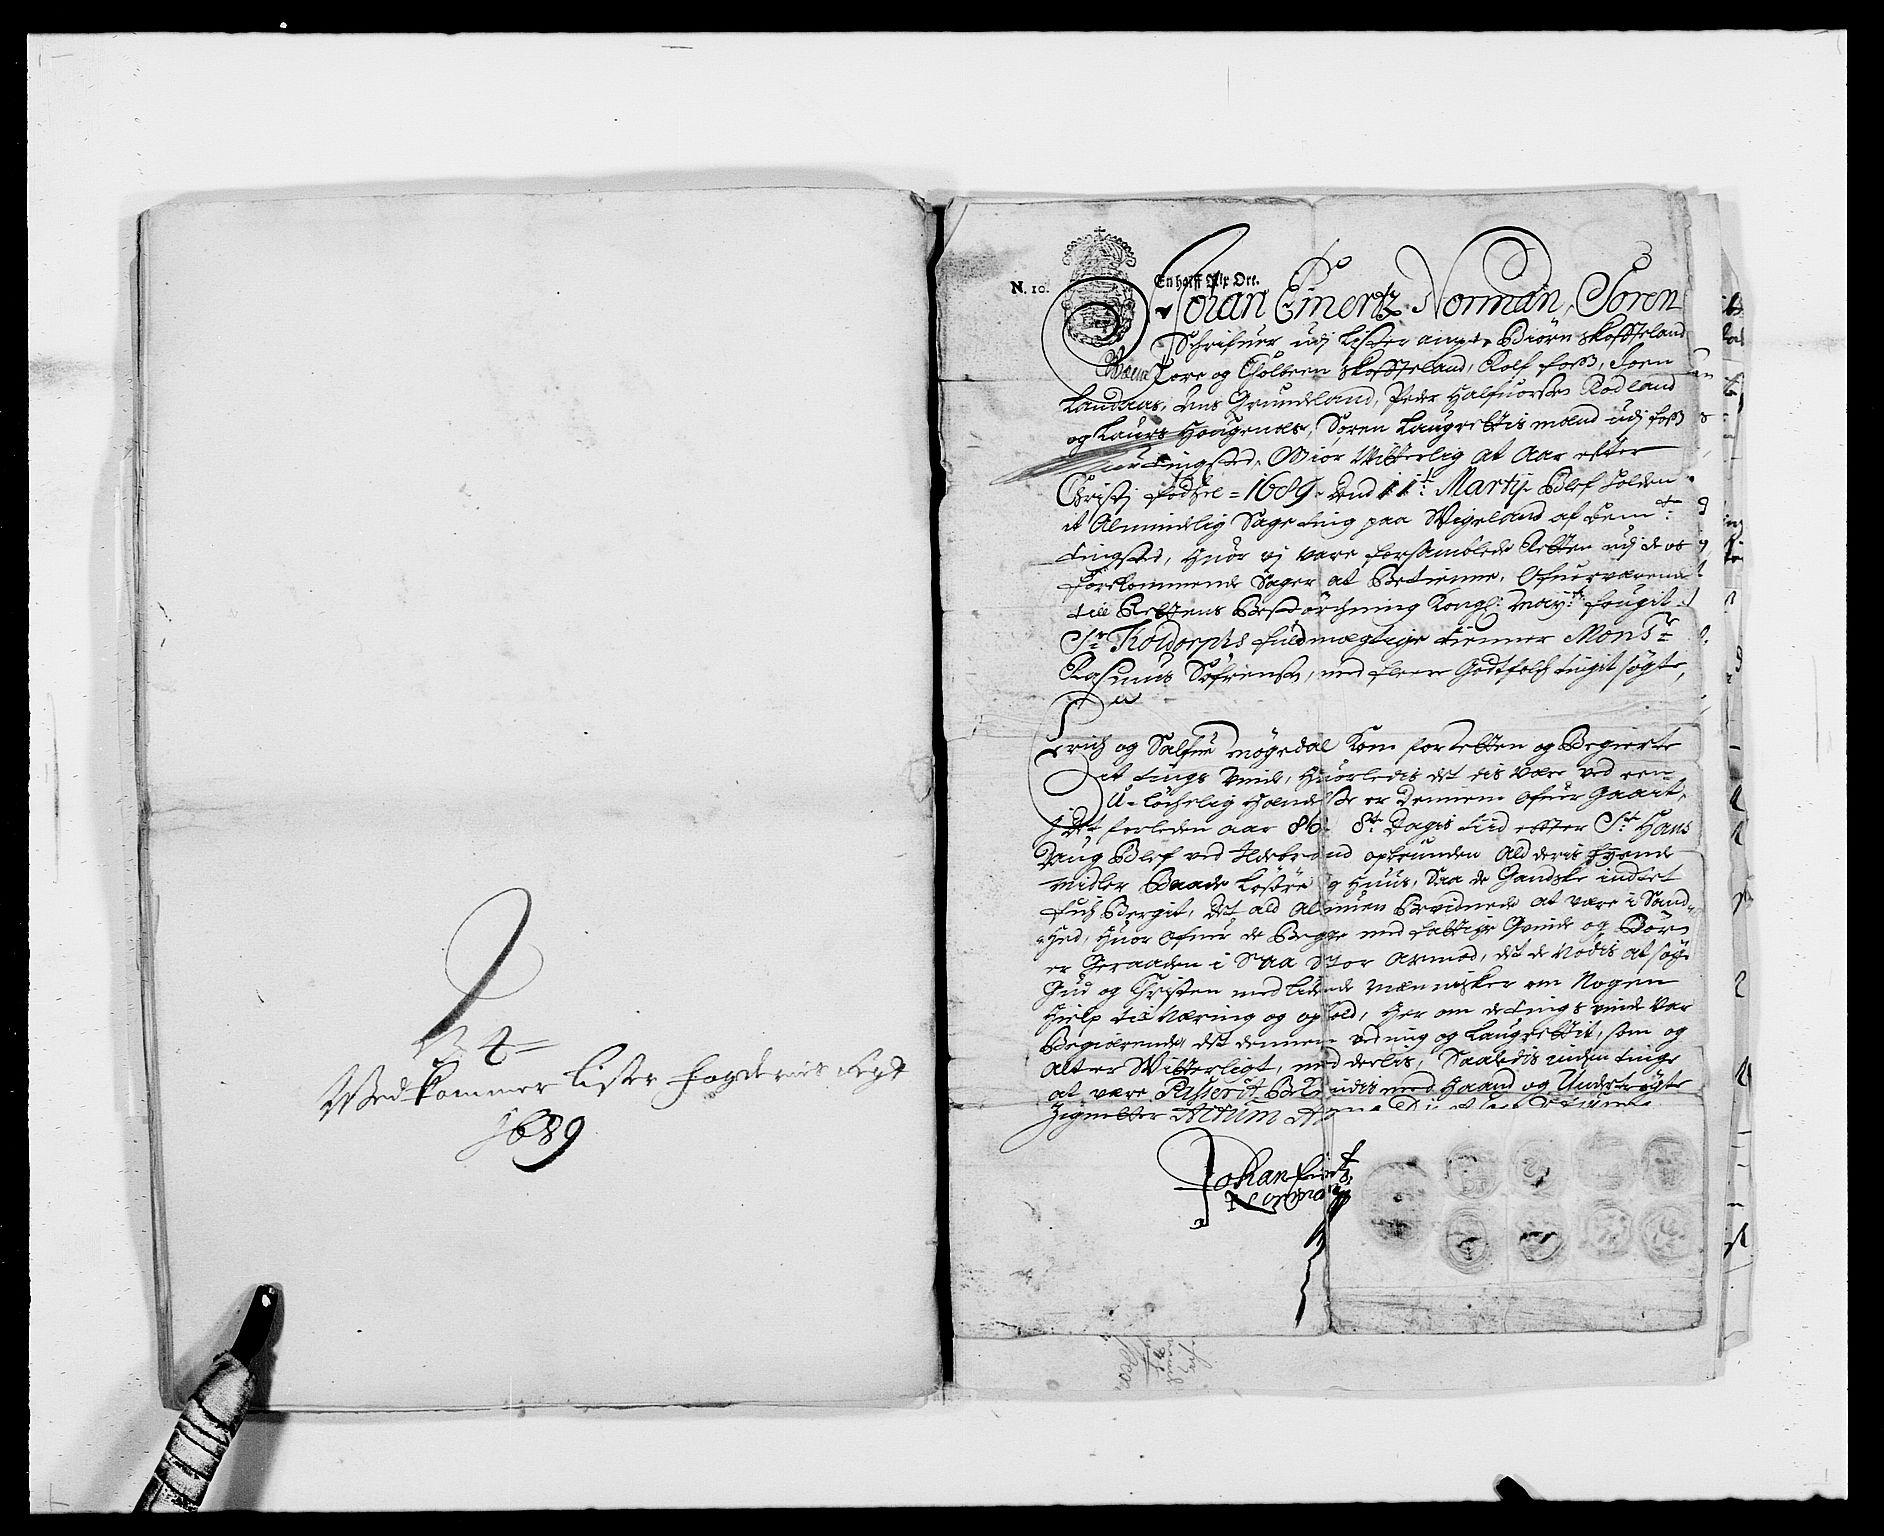 RA, Rentekammeret inntil 1814, Reviderte regnskaper, Fogderegnskap, R41/L2535: Fogderegnskap Lista, 1686-1689, s. 76